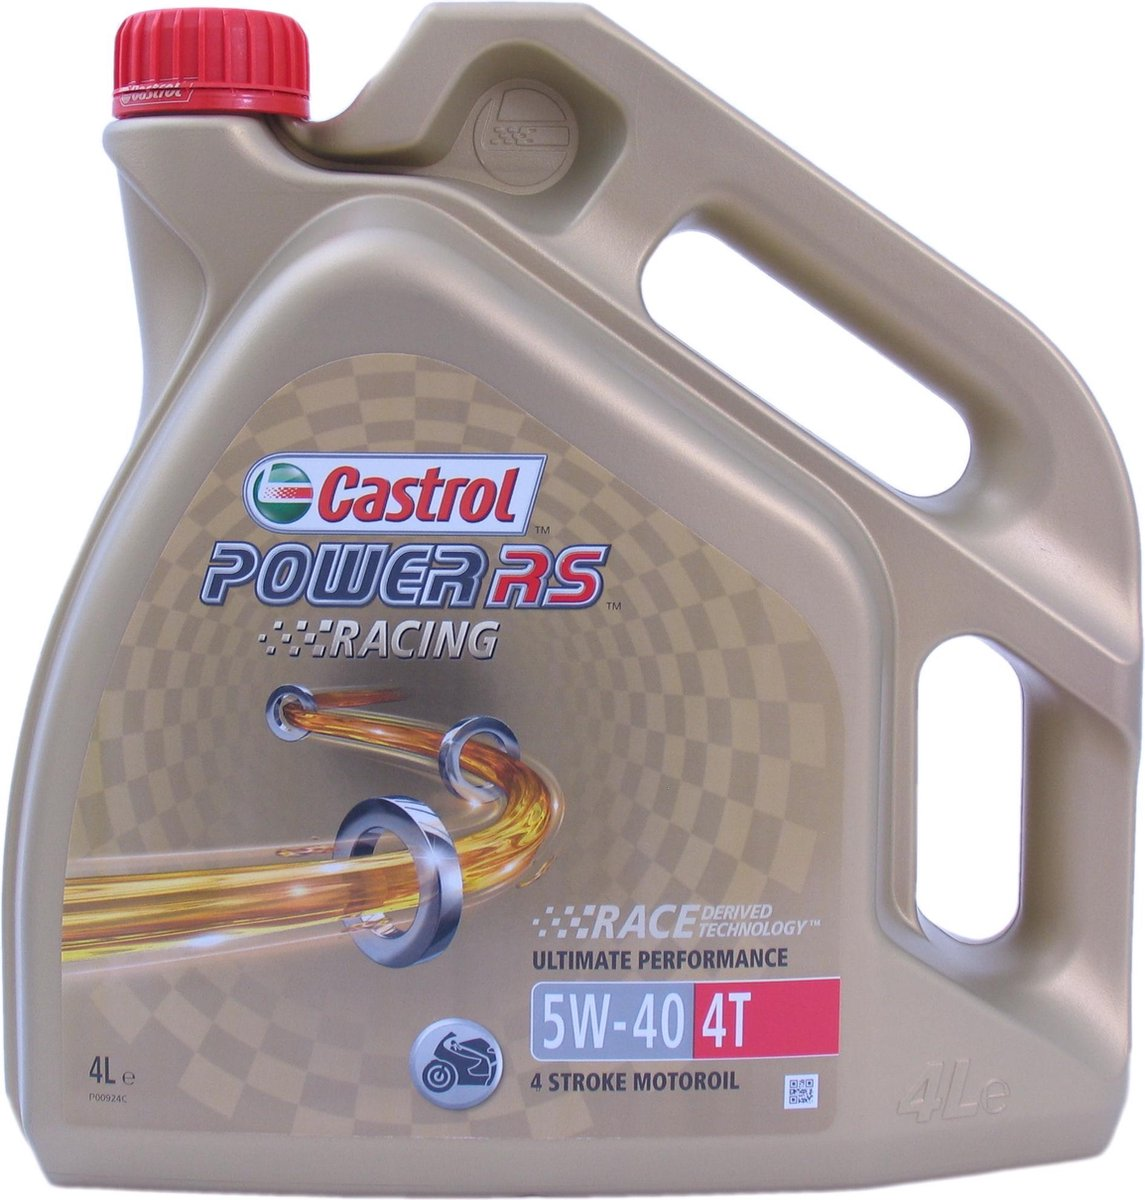 Castrol Power RS Racing 4T 5W-40 - Motorolie - 4L